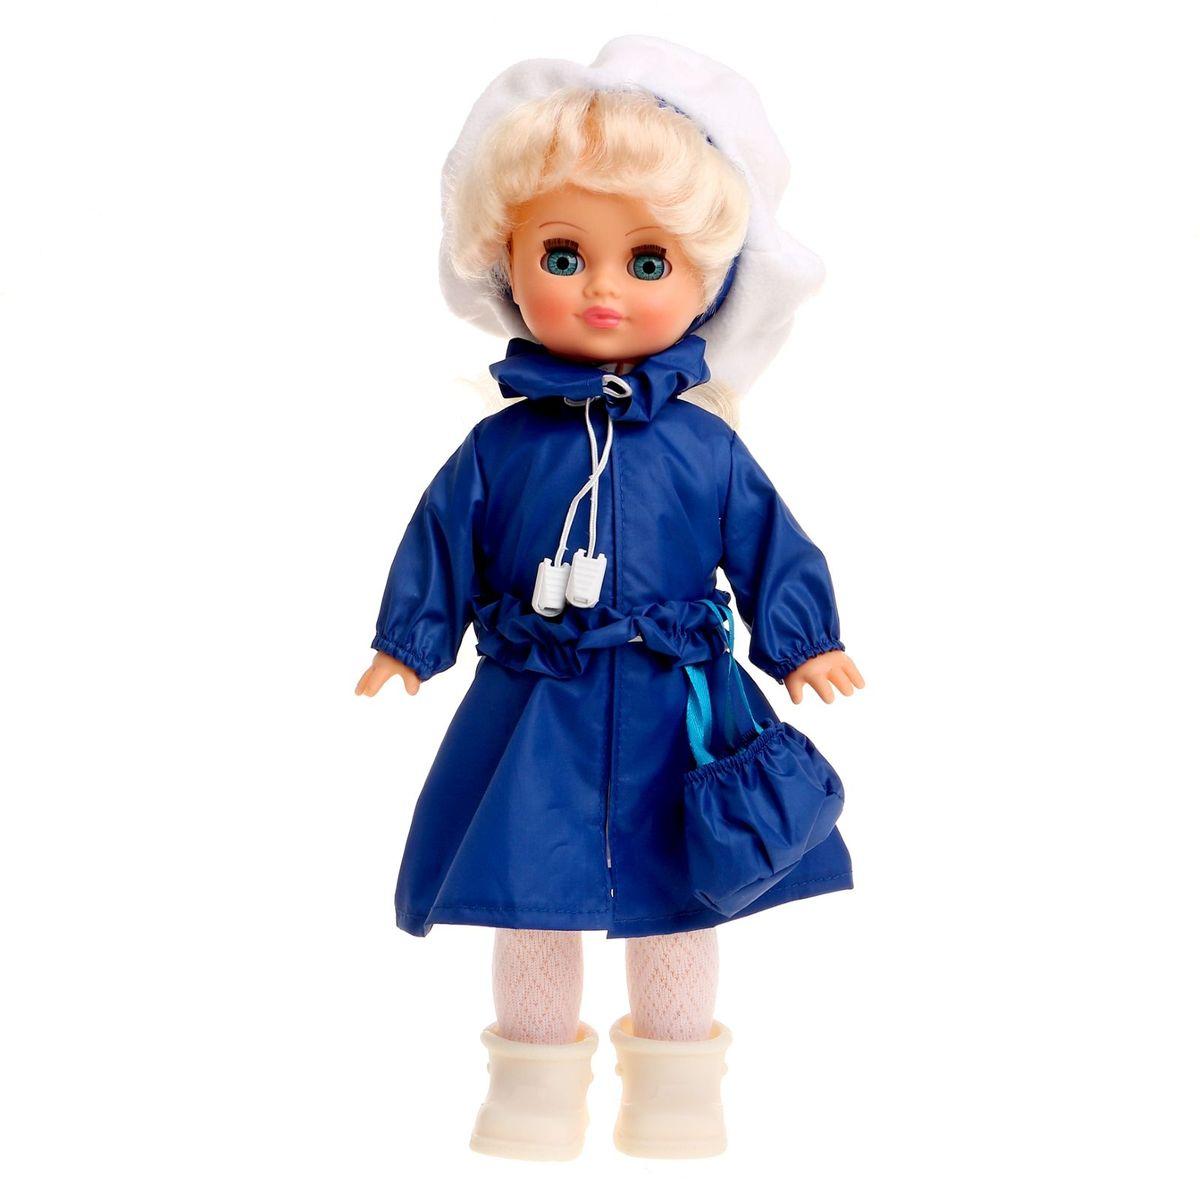 Sima-land Кукла озвученная Маргарита 38 см 916854 кукла весна маргарита 11 озвученная